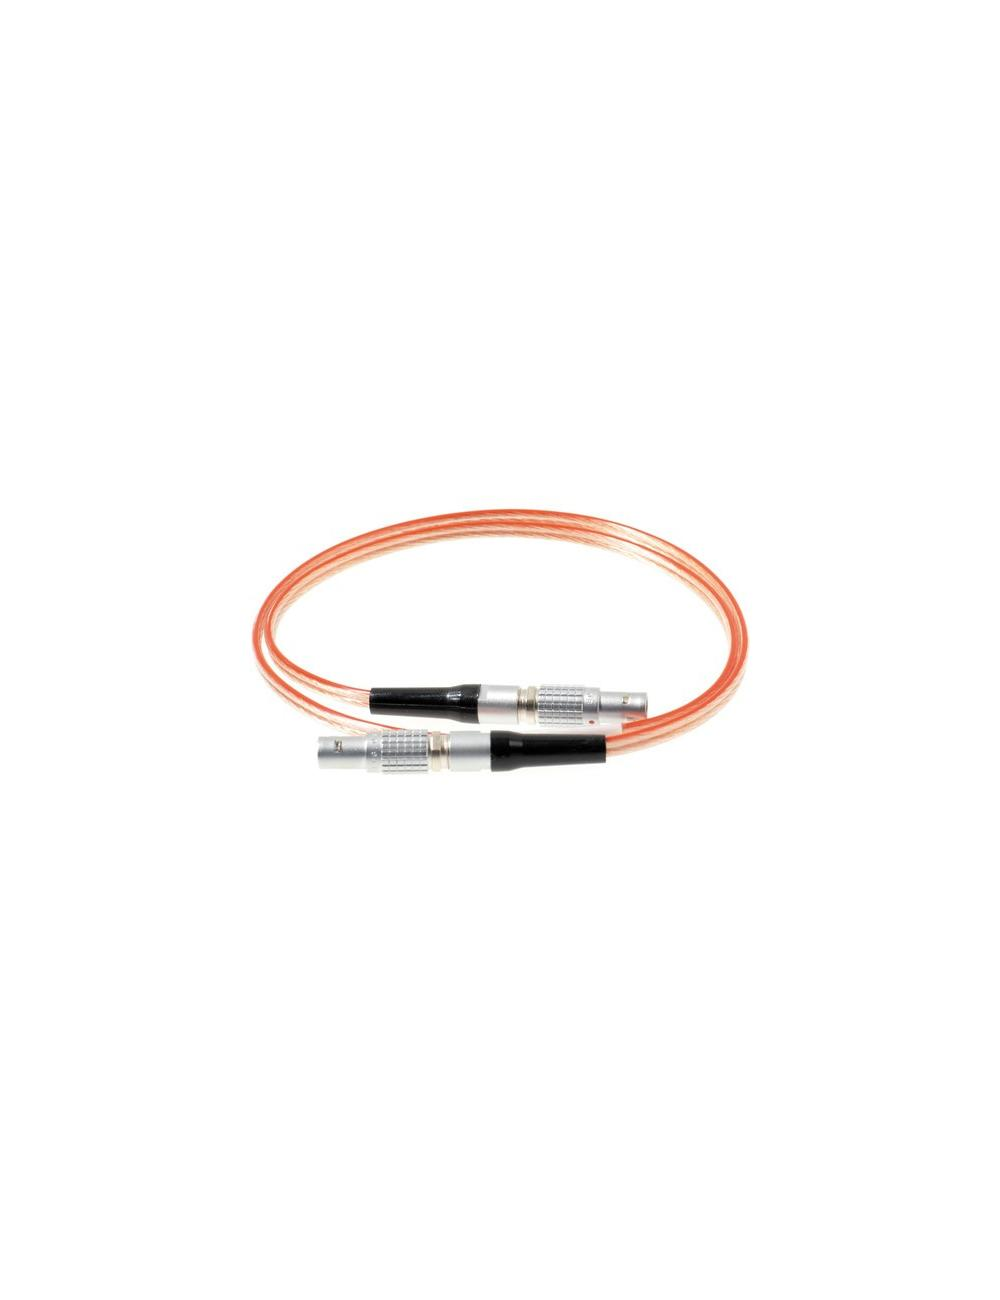 Chrosziel - Cable de alimentación MN-STU24